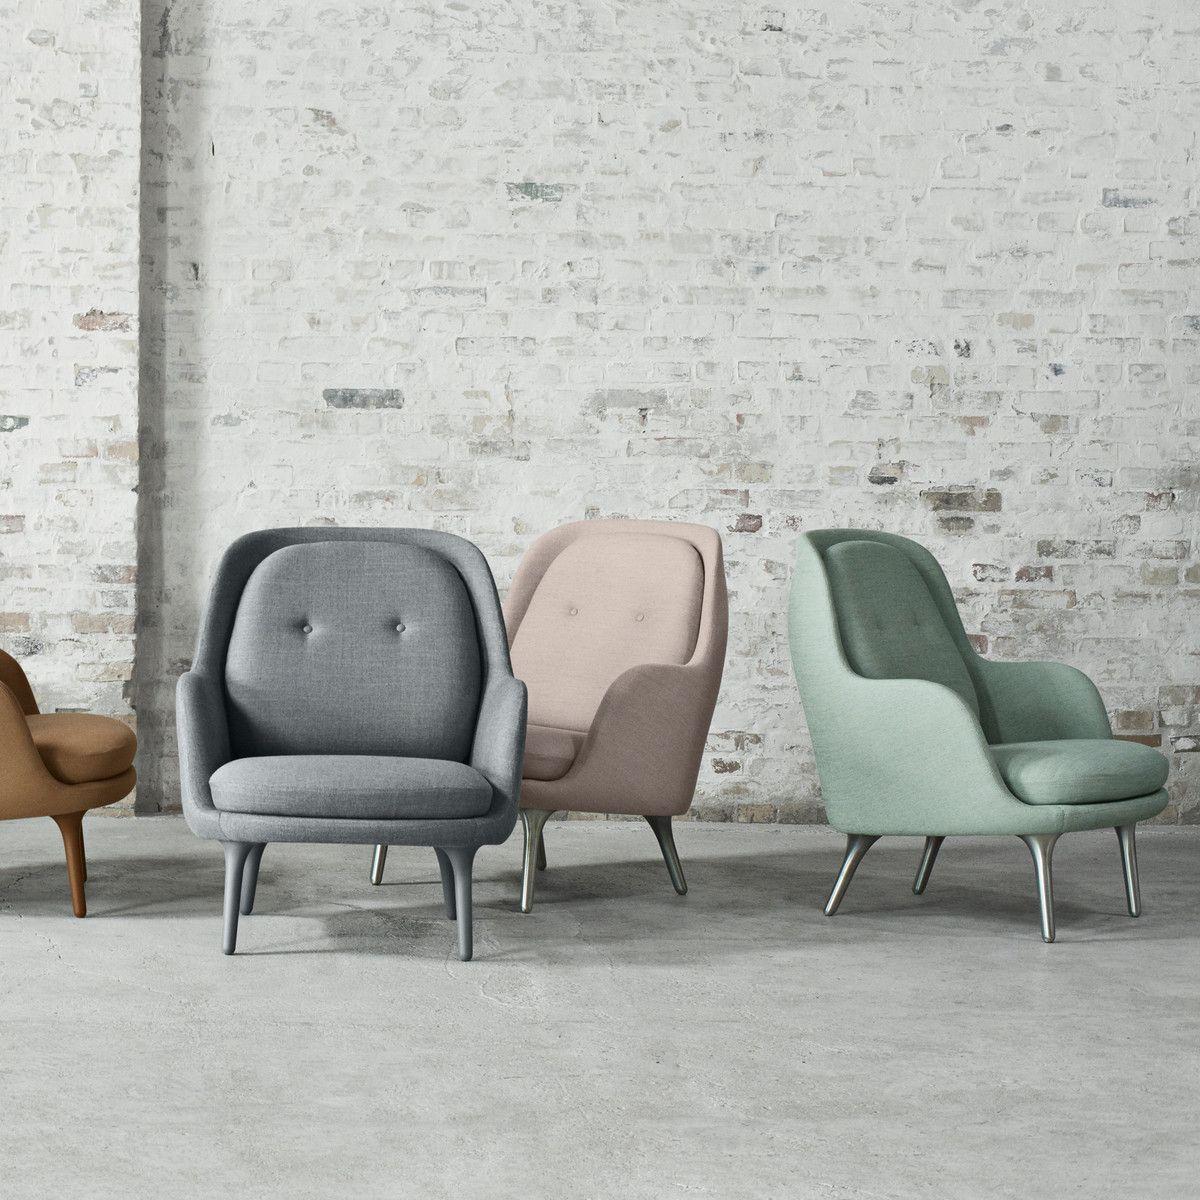 Sessel Design Von Jaime Hayon | Fritz Hansen Fri Sessel Gruppe Classic Chairs Pinte